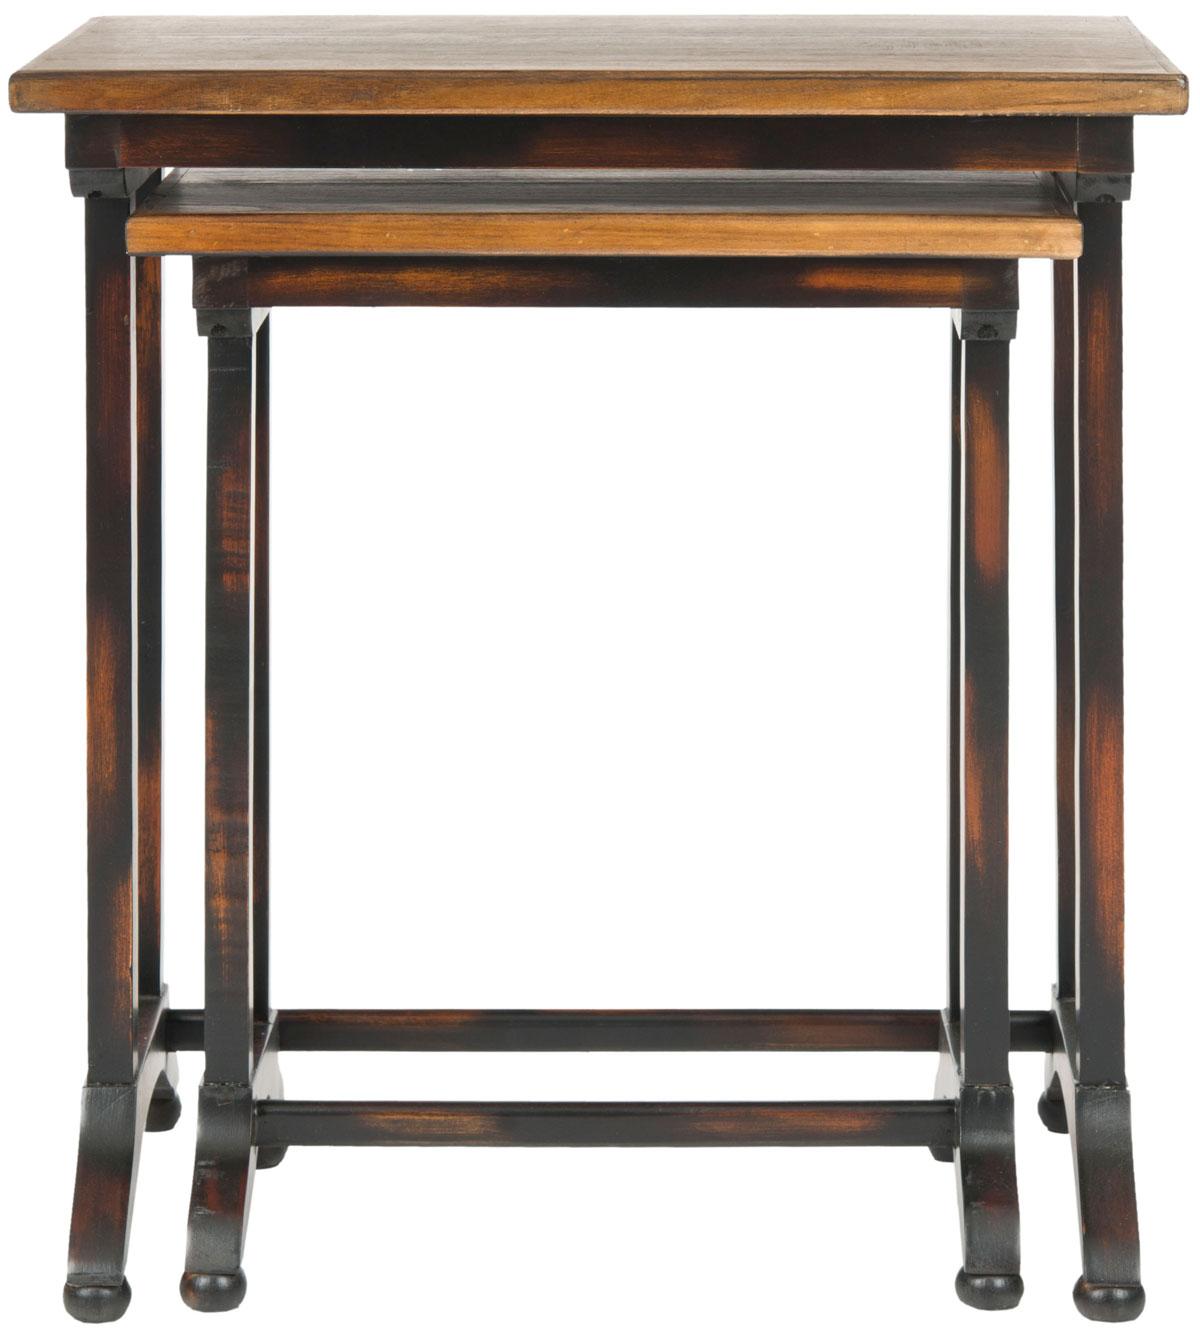 AMH4005A Consoles - Furniture by Safavieh  Safavieh